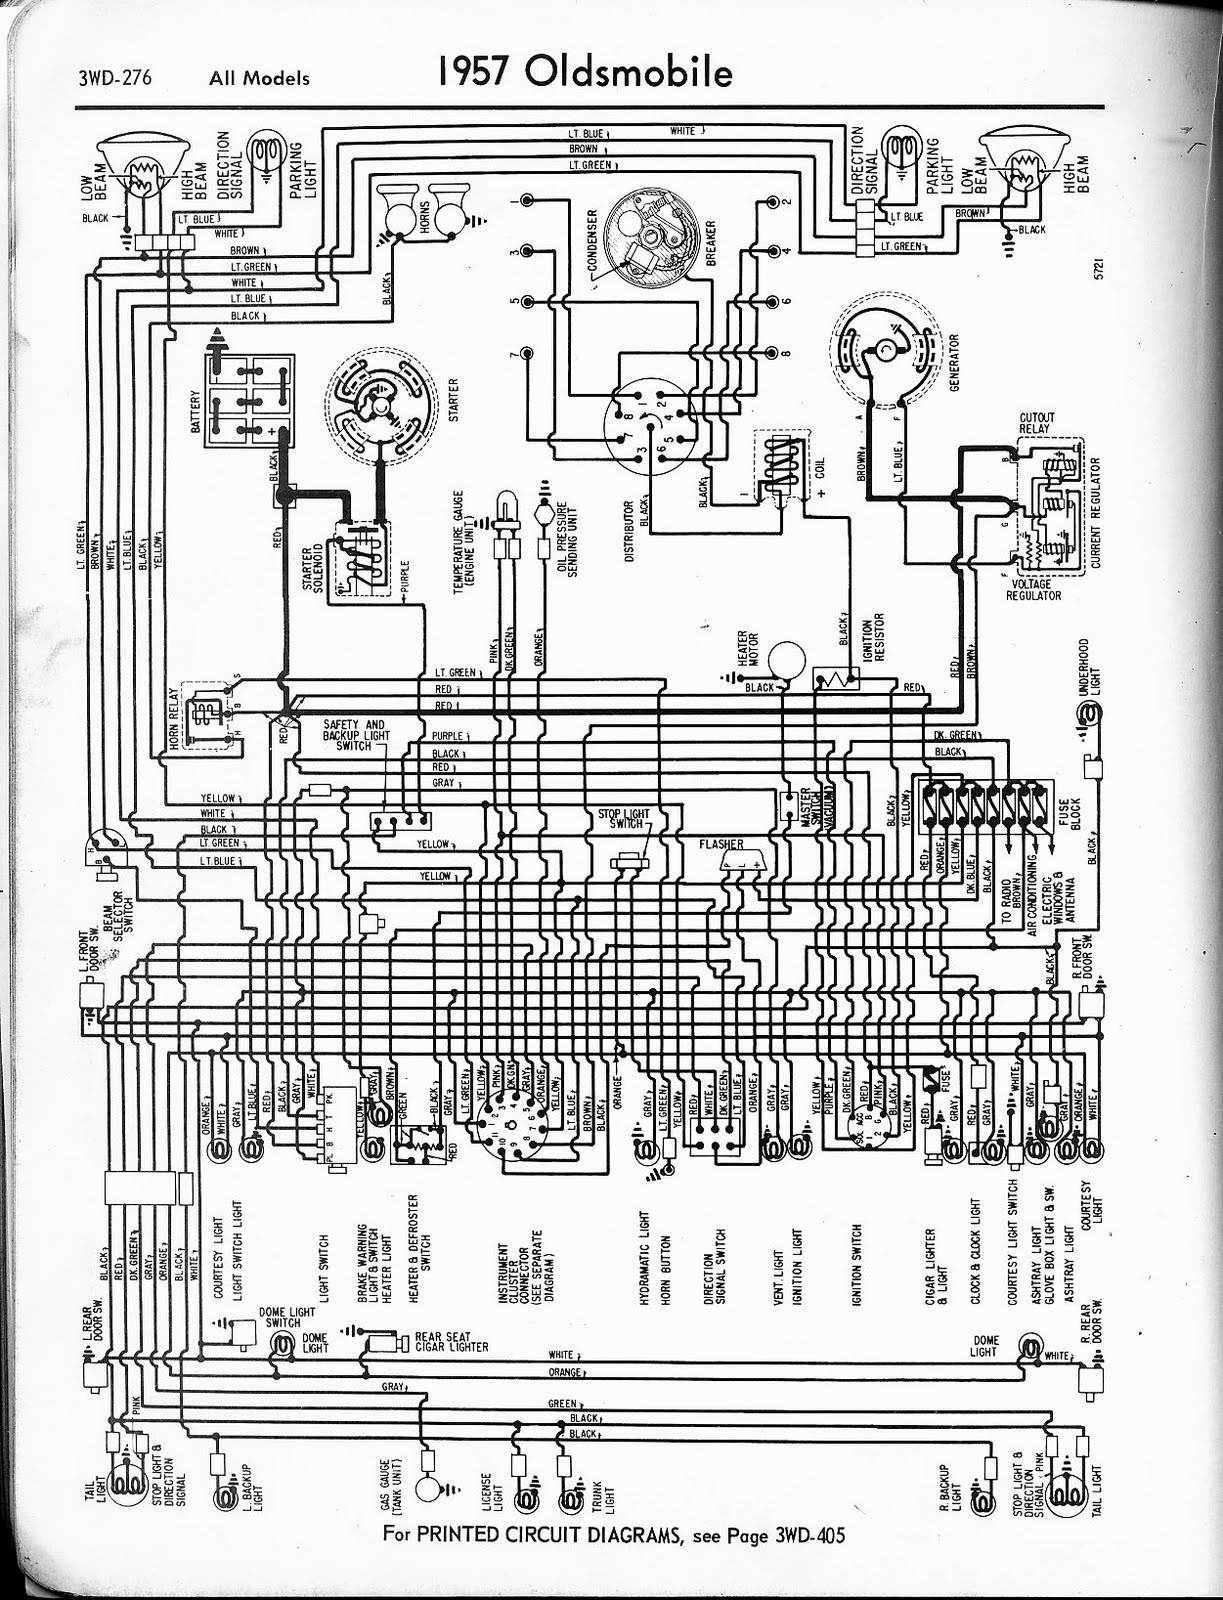 1990 Jeep Wrangler Ignition Wiring Diagram Aftermarket Fog Lights Free Auto Diagram: 1957 Oldsmobile For All Models